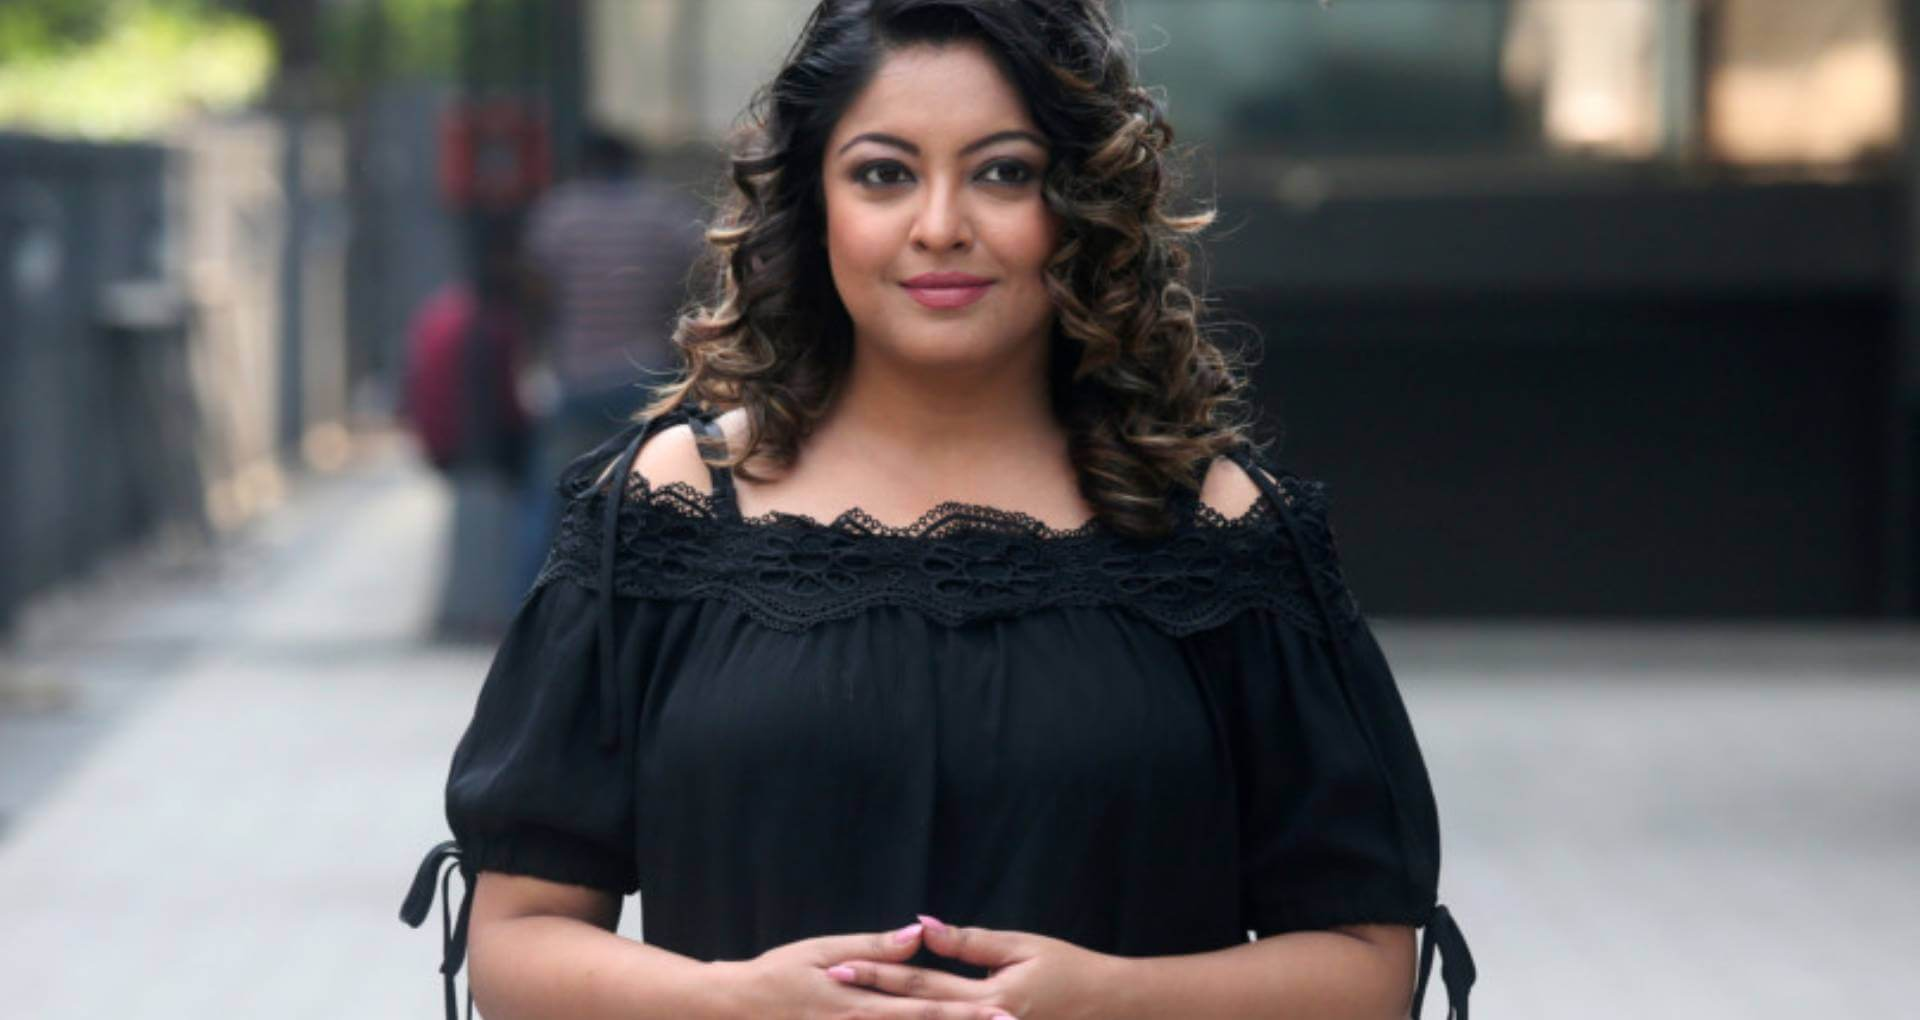 Tanushree Dutta Age, Sister, Latest News, Husband, Family, Net Worth, Height, Image(photo), Birthday, Biography, Married, Education, Wiki, Instagram, Twitter, Facebook, Imdb (6) (1)